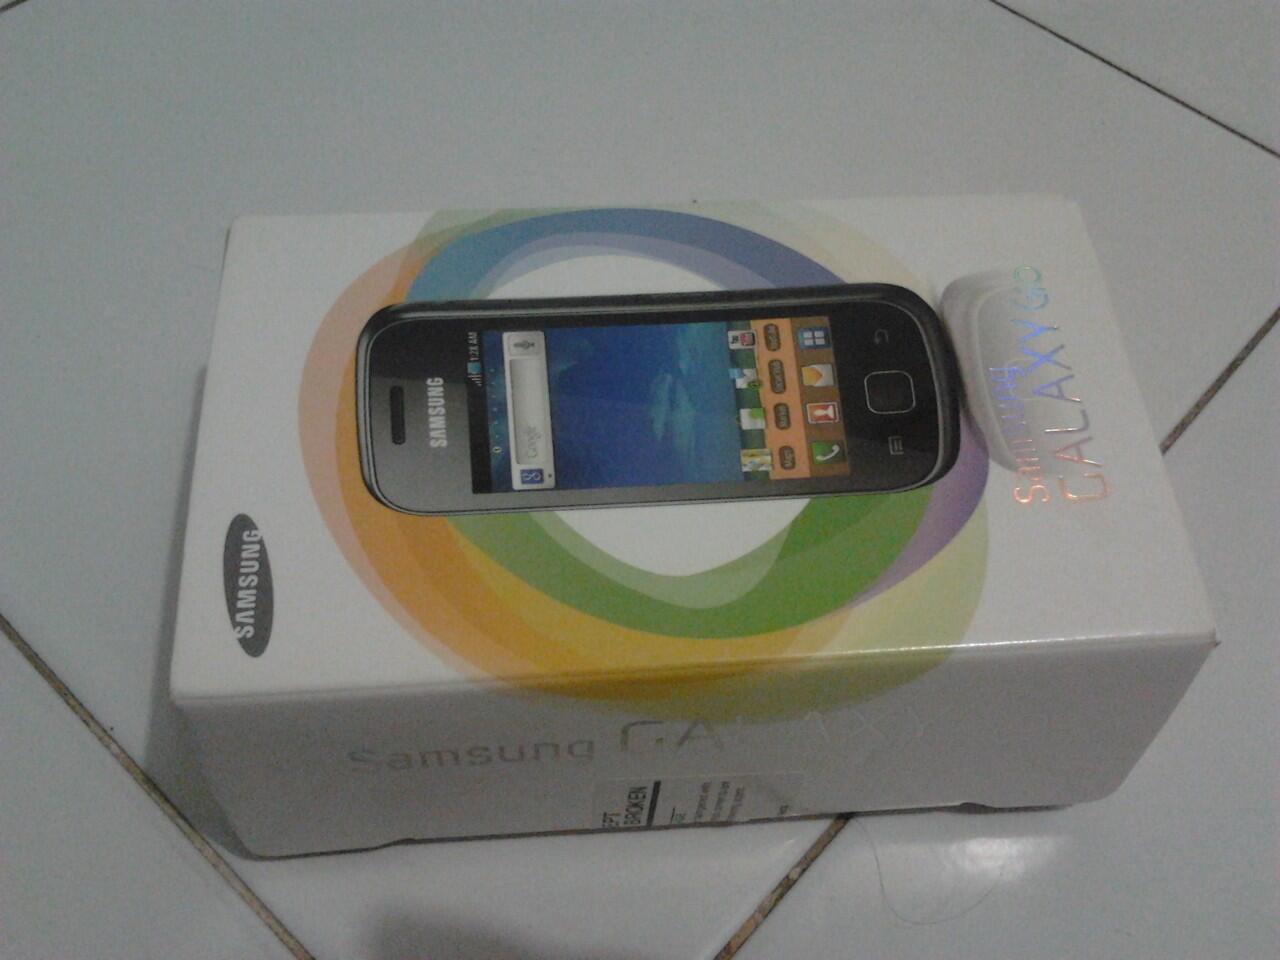 [WTS] Samsung Galaxy Gio S5660